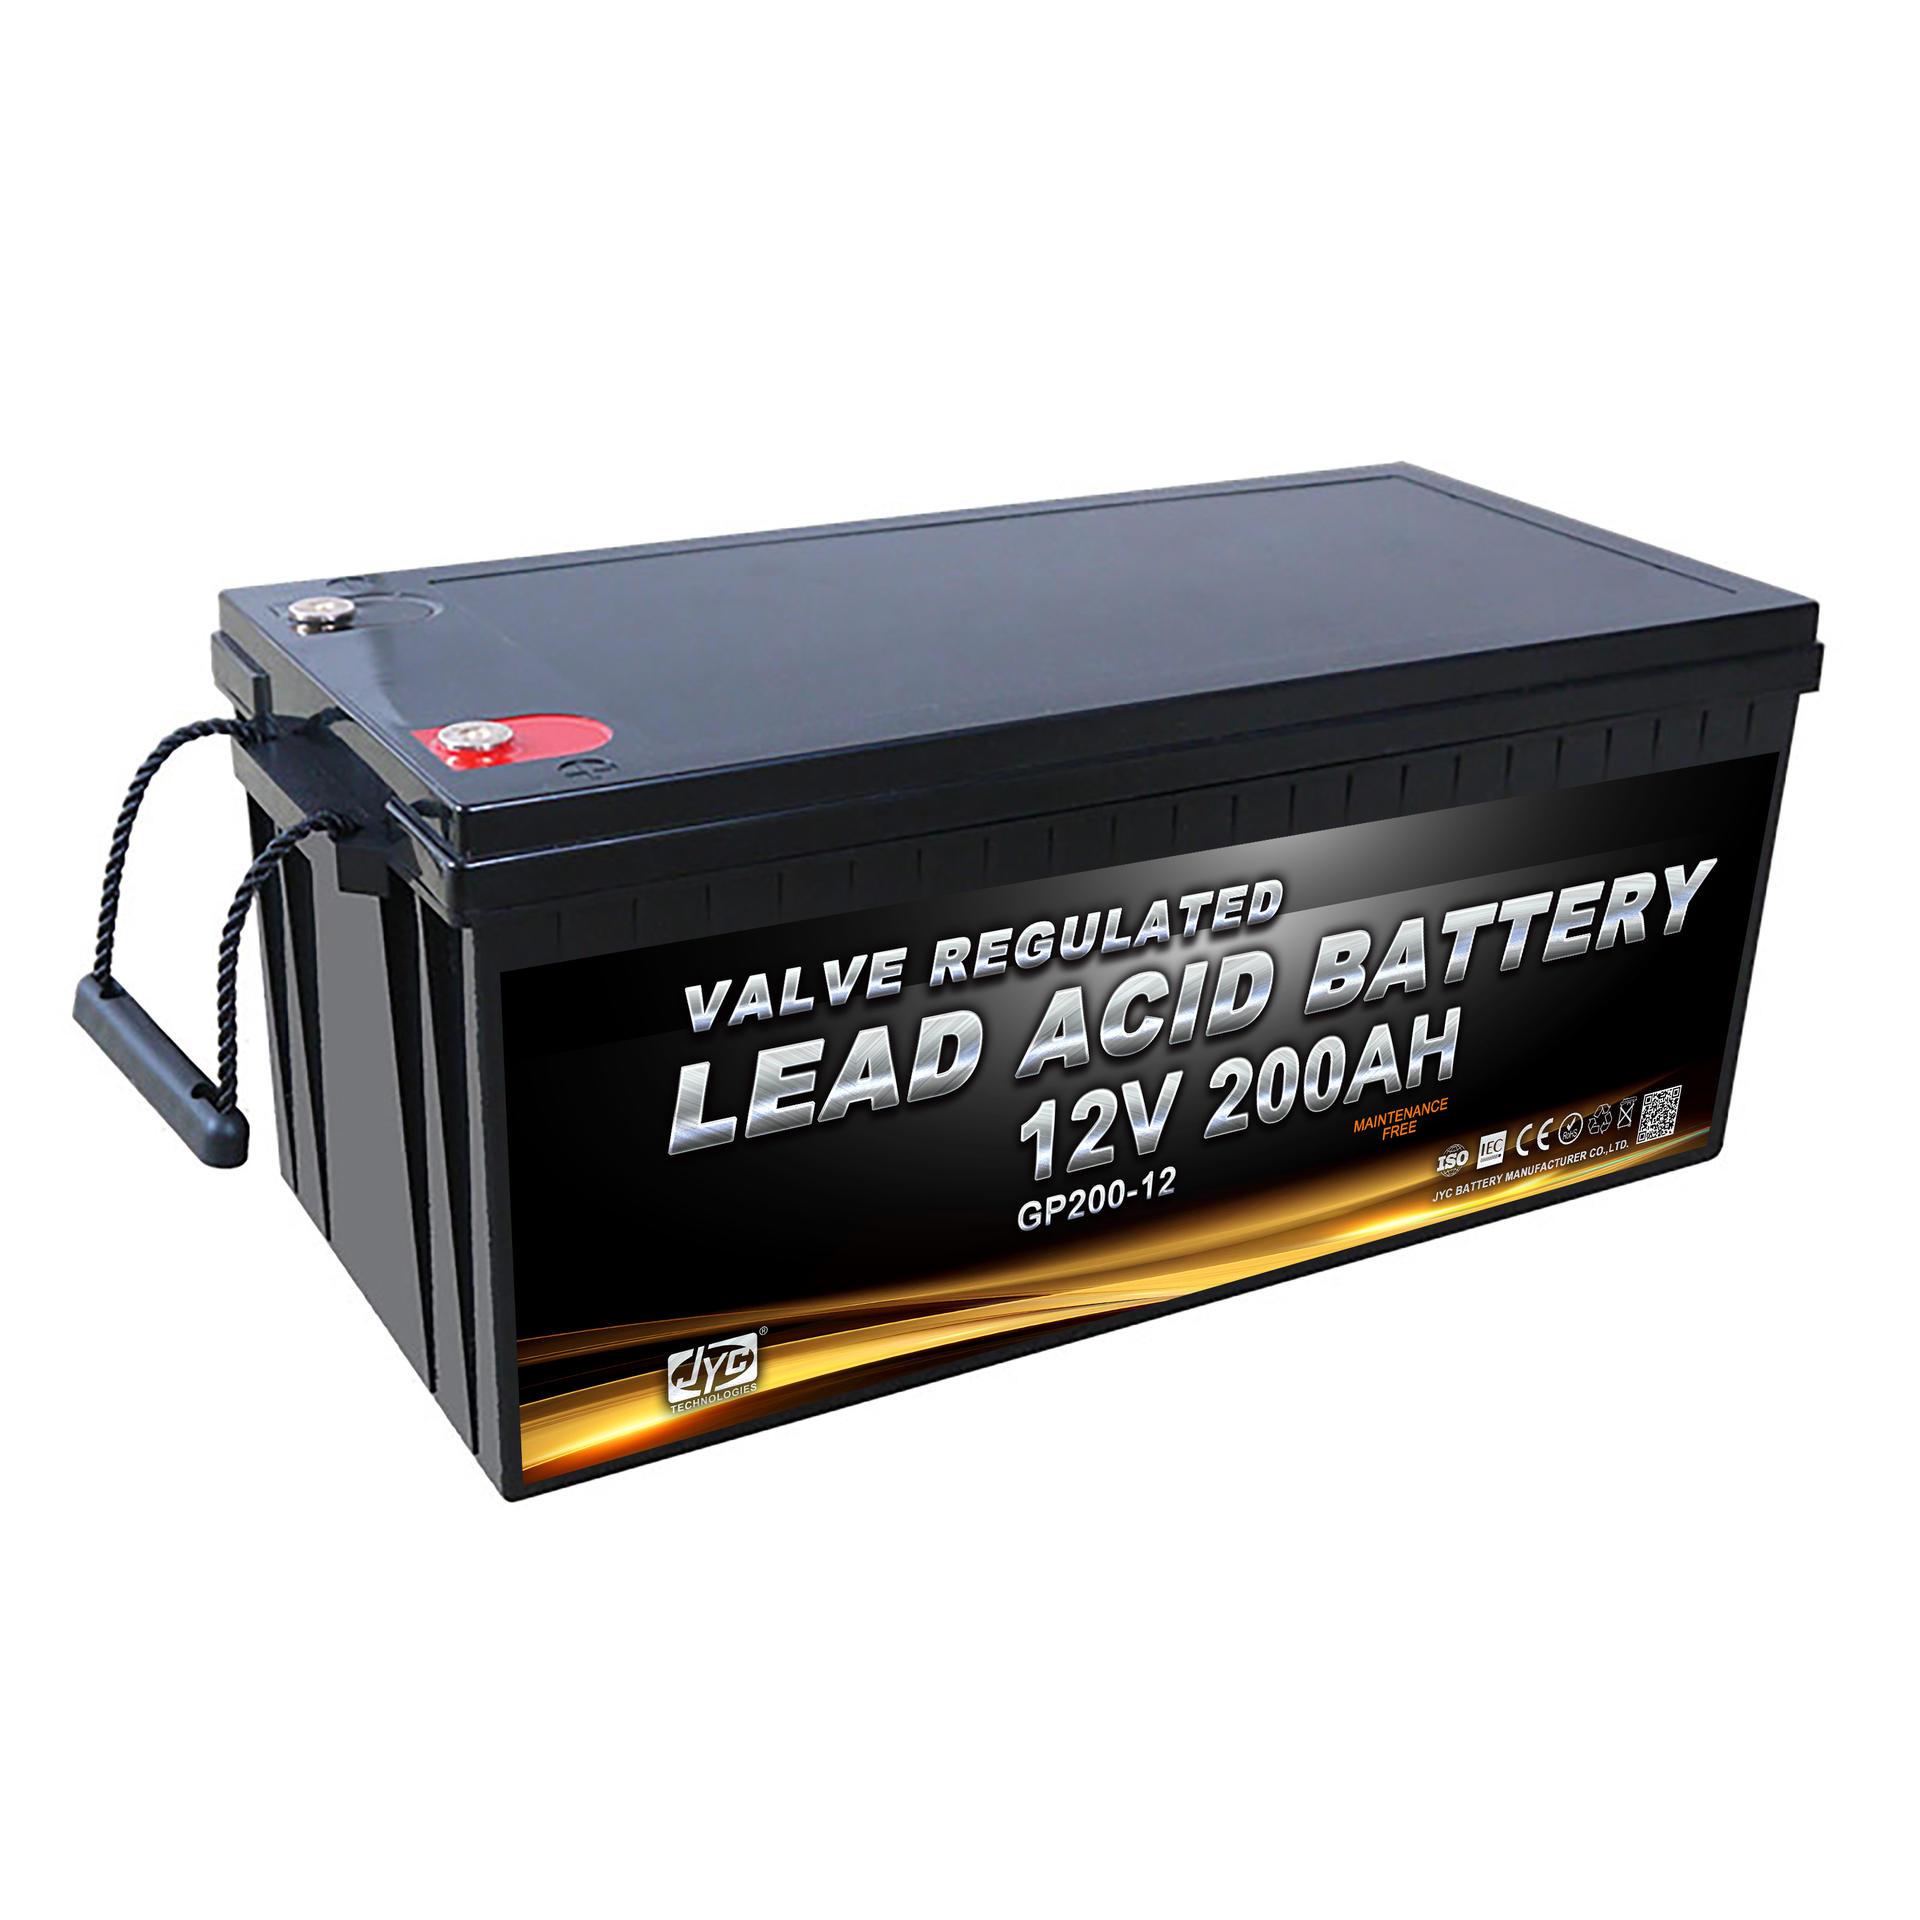 JYC alibaba old supplier 12v 200ah lead crystal battery for solar